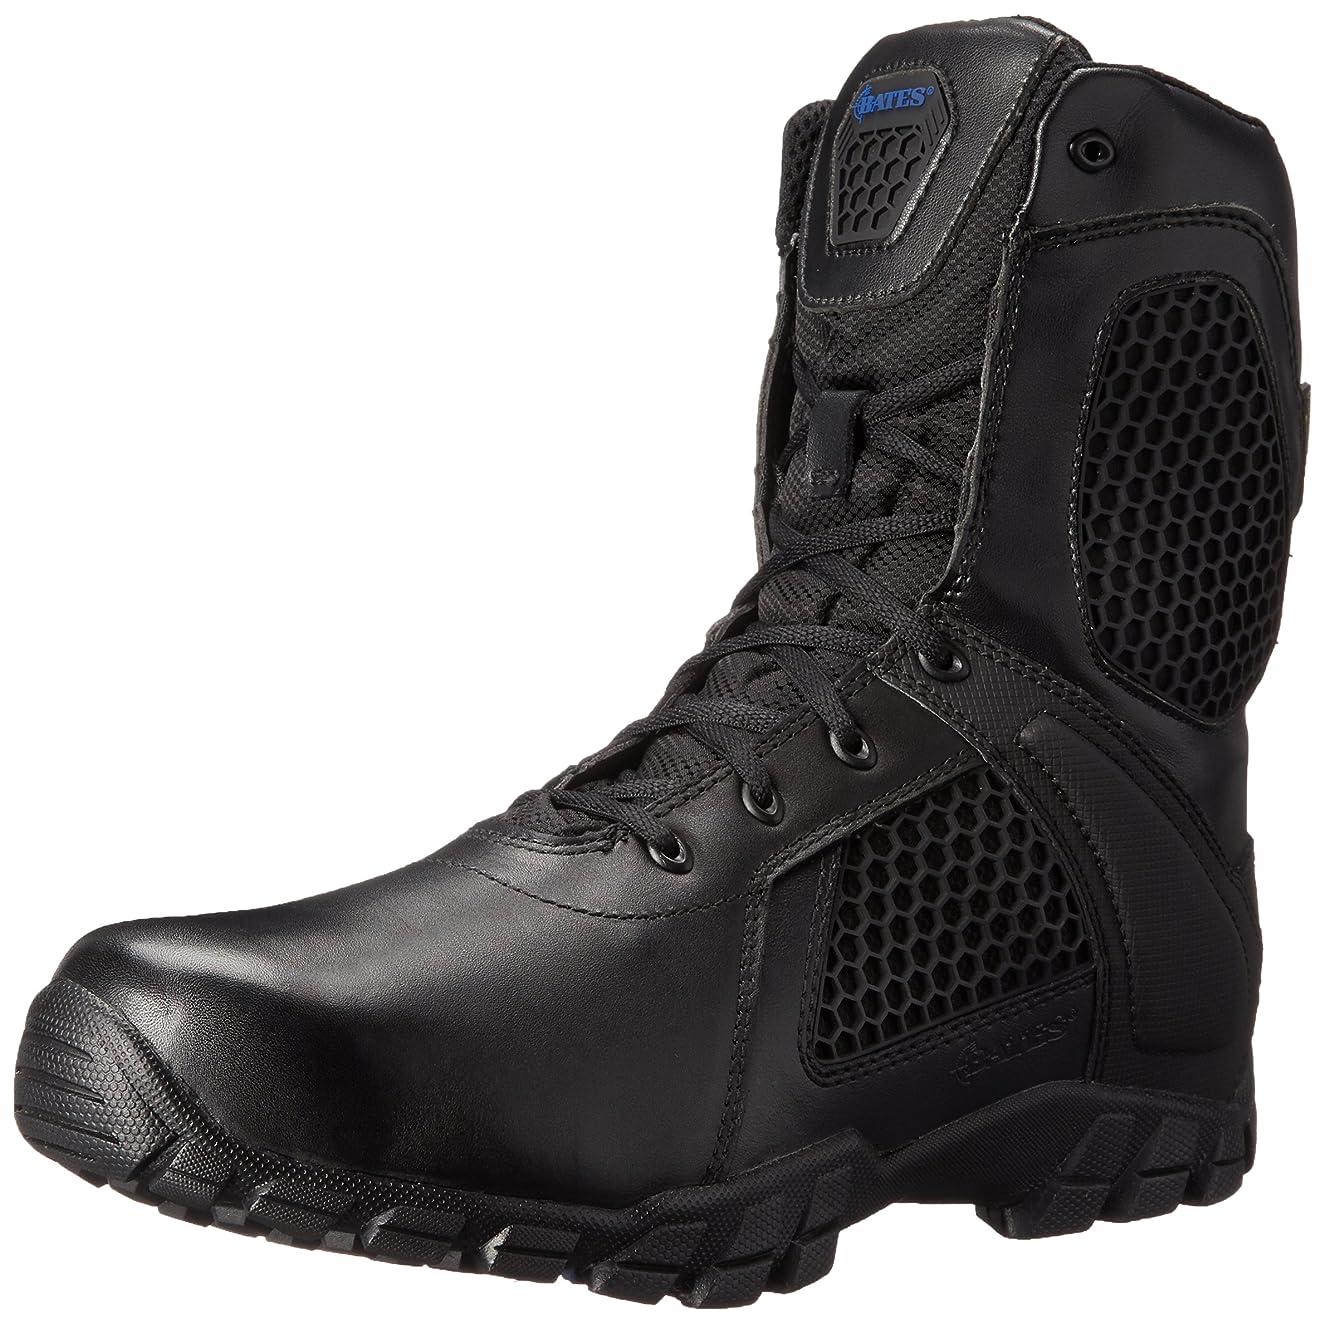 20f0847674fa UPSTONE Work Shoes for Men, Indestructible Steel Toe Battlefield ...